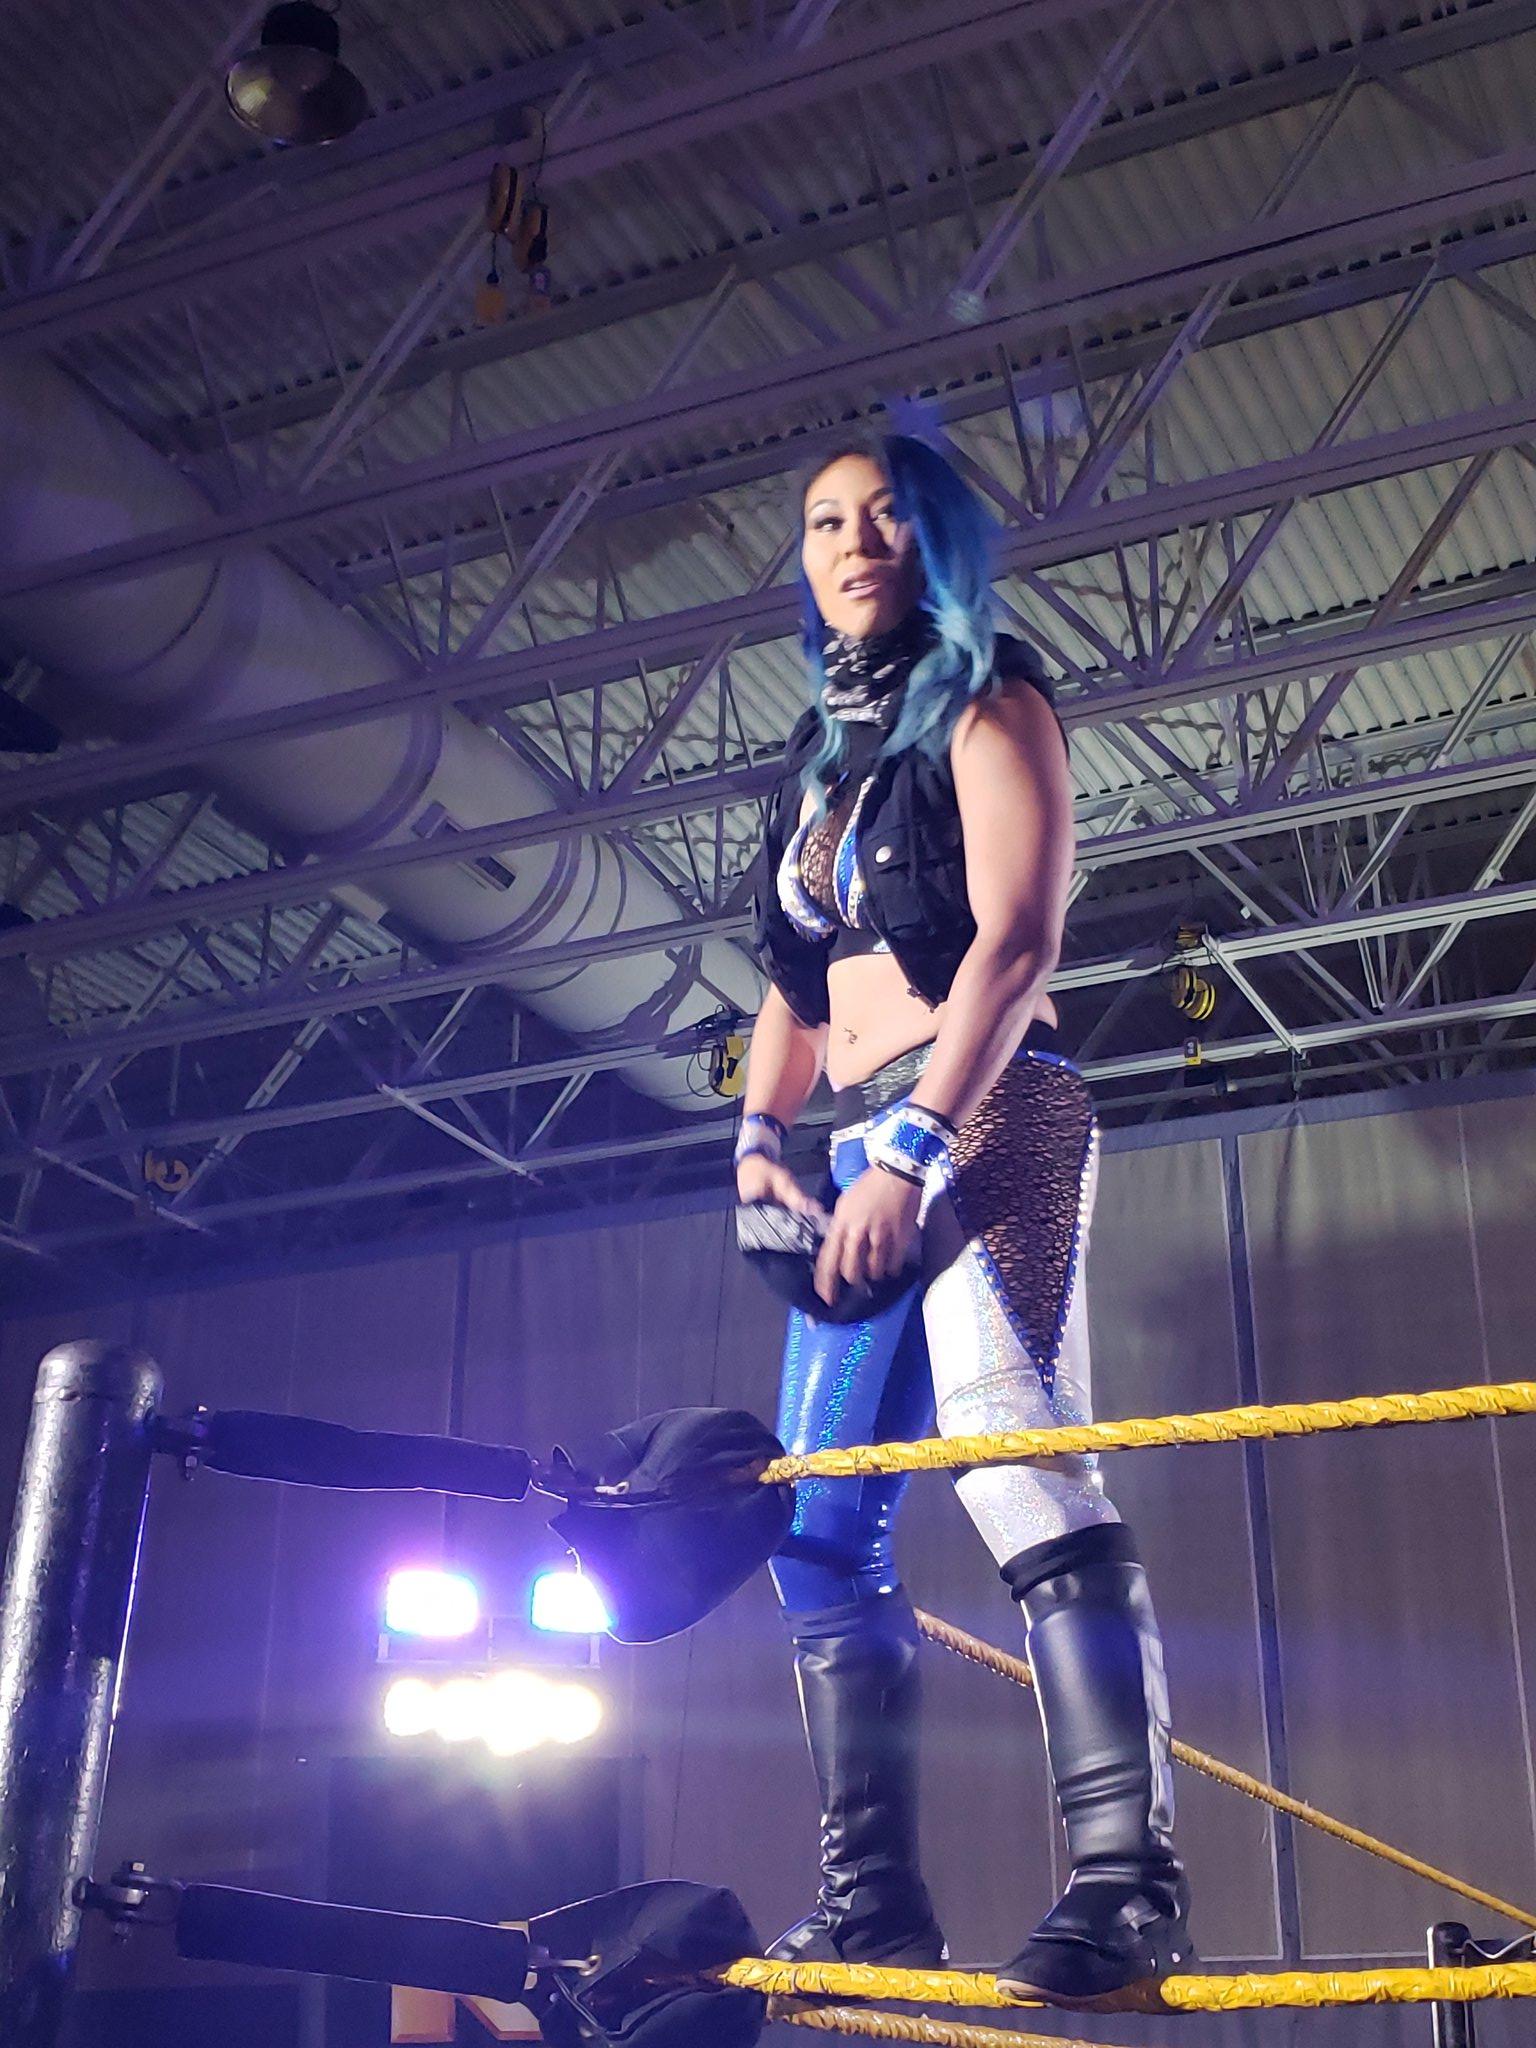 Mia Yim - The Blasian Baddie - Page 9 - Wrestling Forum: WWE, Impact Wrestling, Indy Wrestling